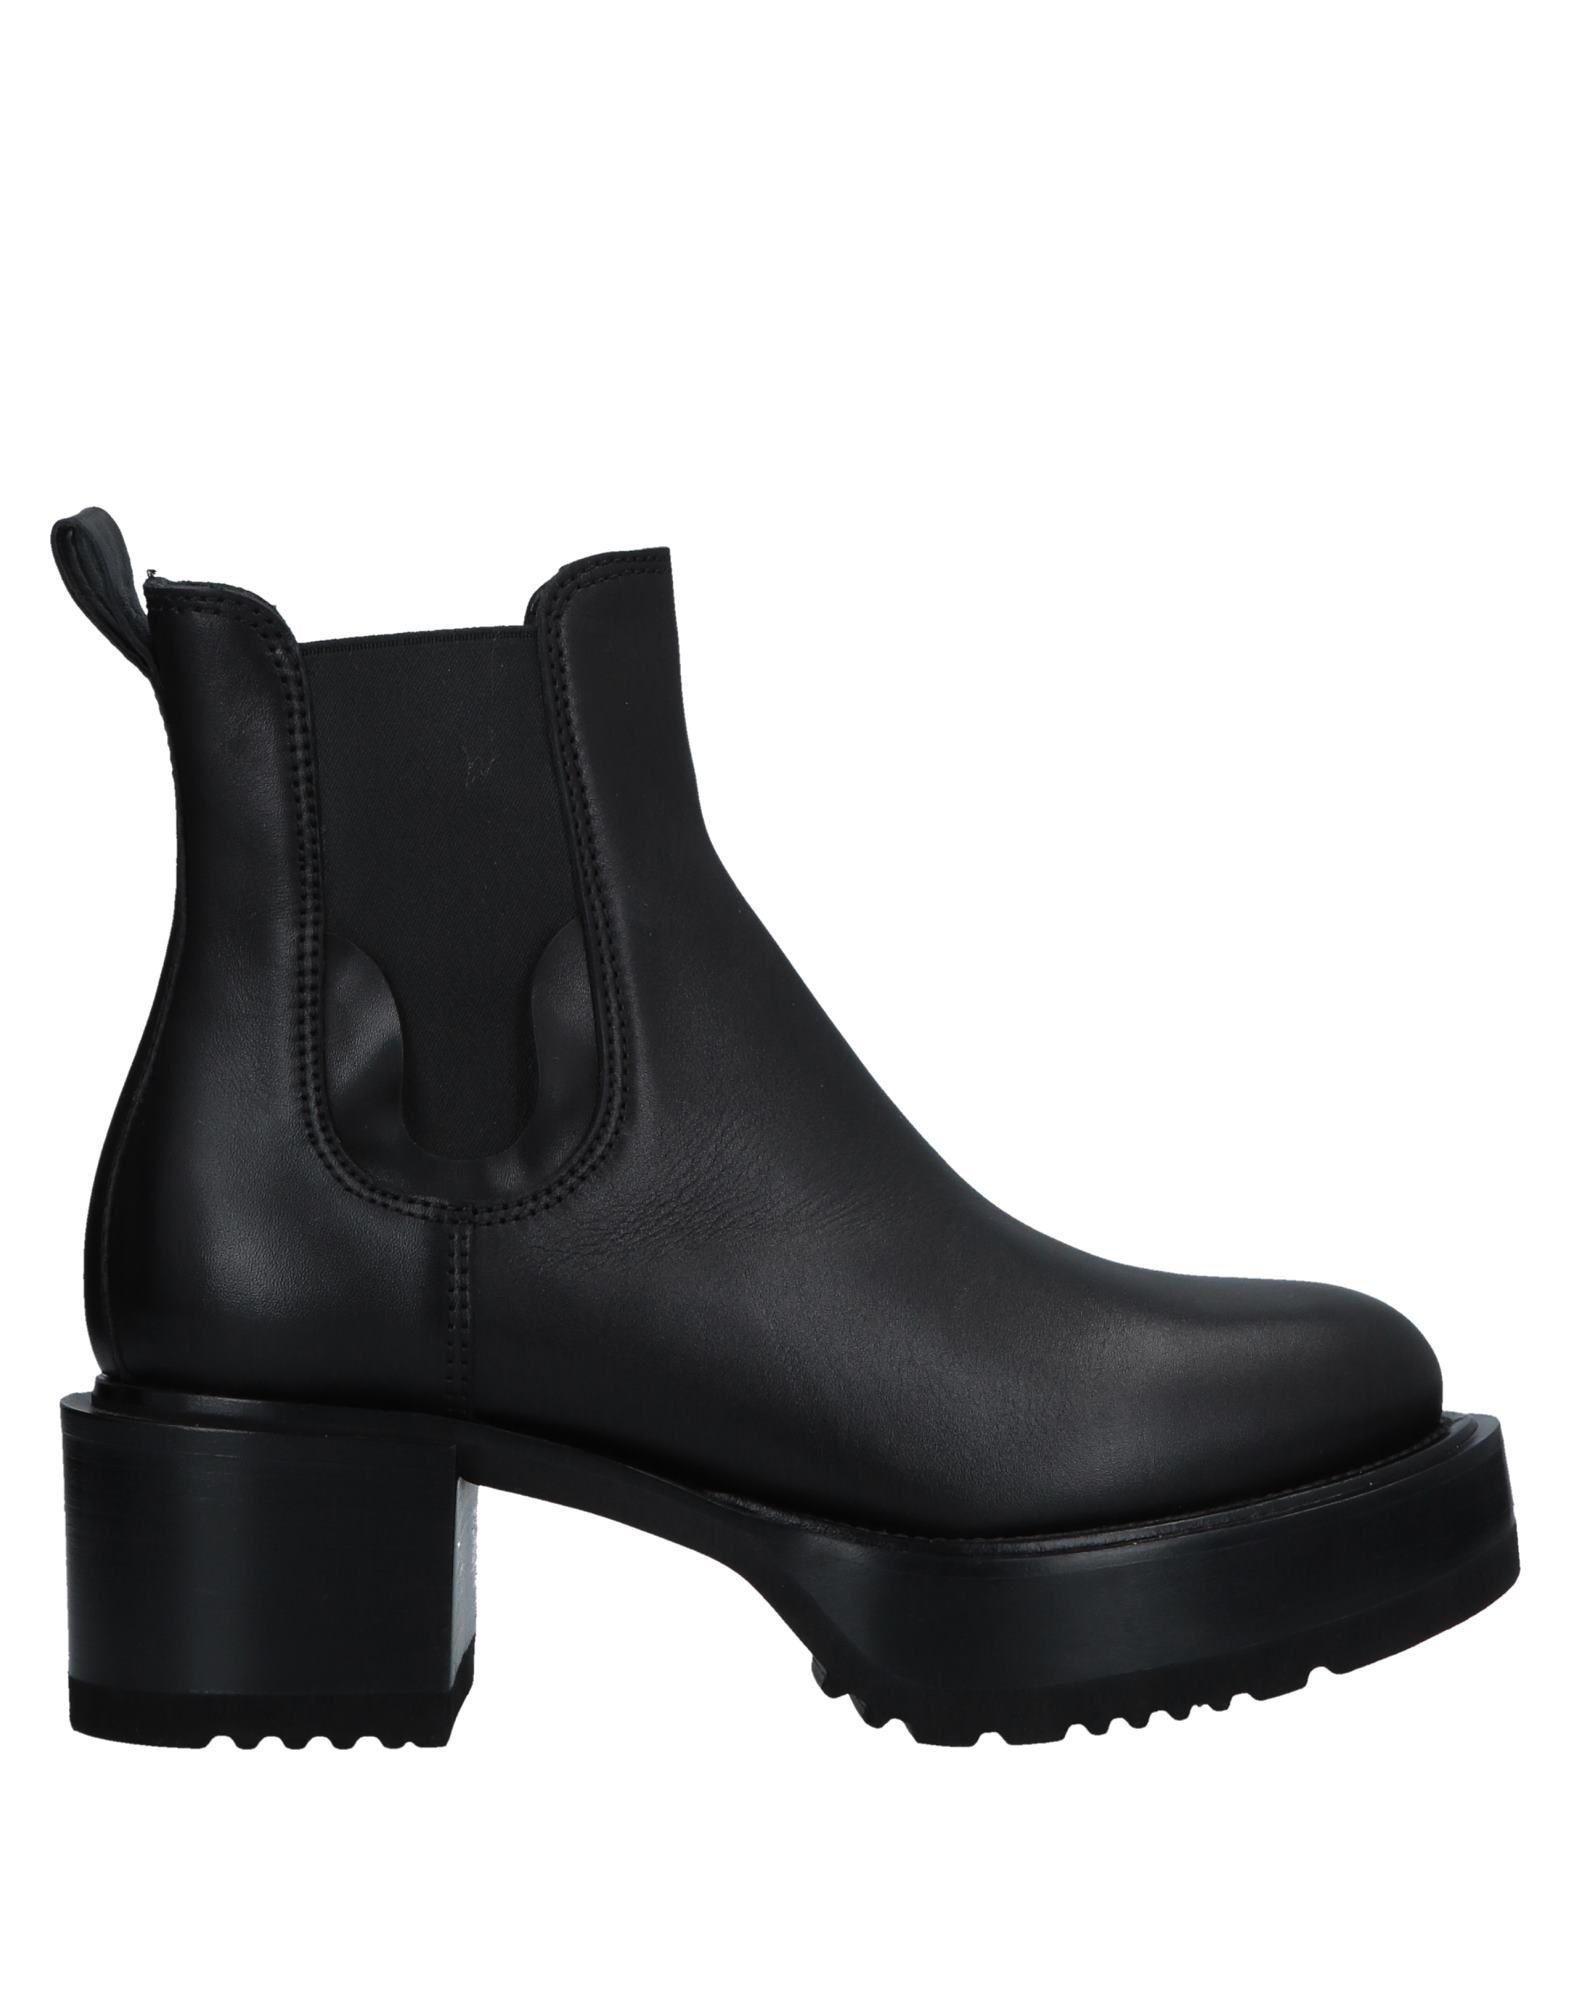 Chelsea stivali stivali Premiata donna - 11699512SF  bis zu 70% sparen